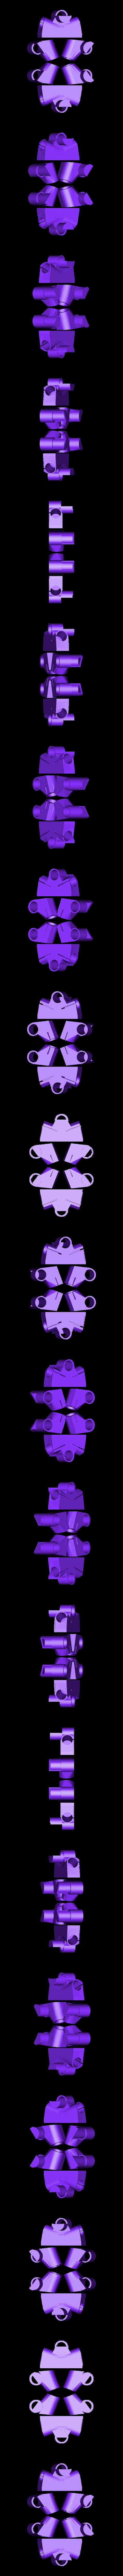 Hyphen smaller joints.stl Download free STL file Hyphen Table • 3D print model, Hyphen